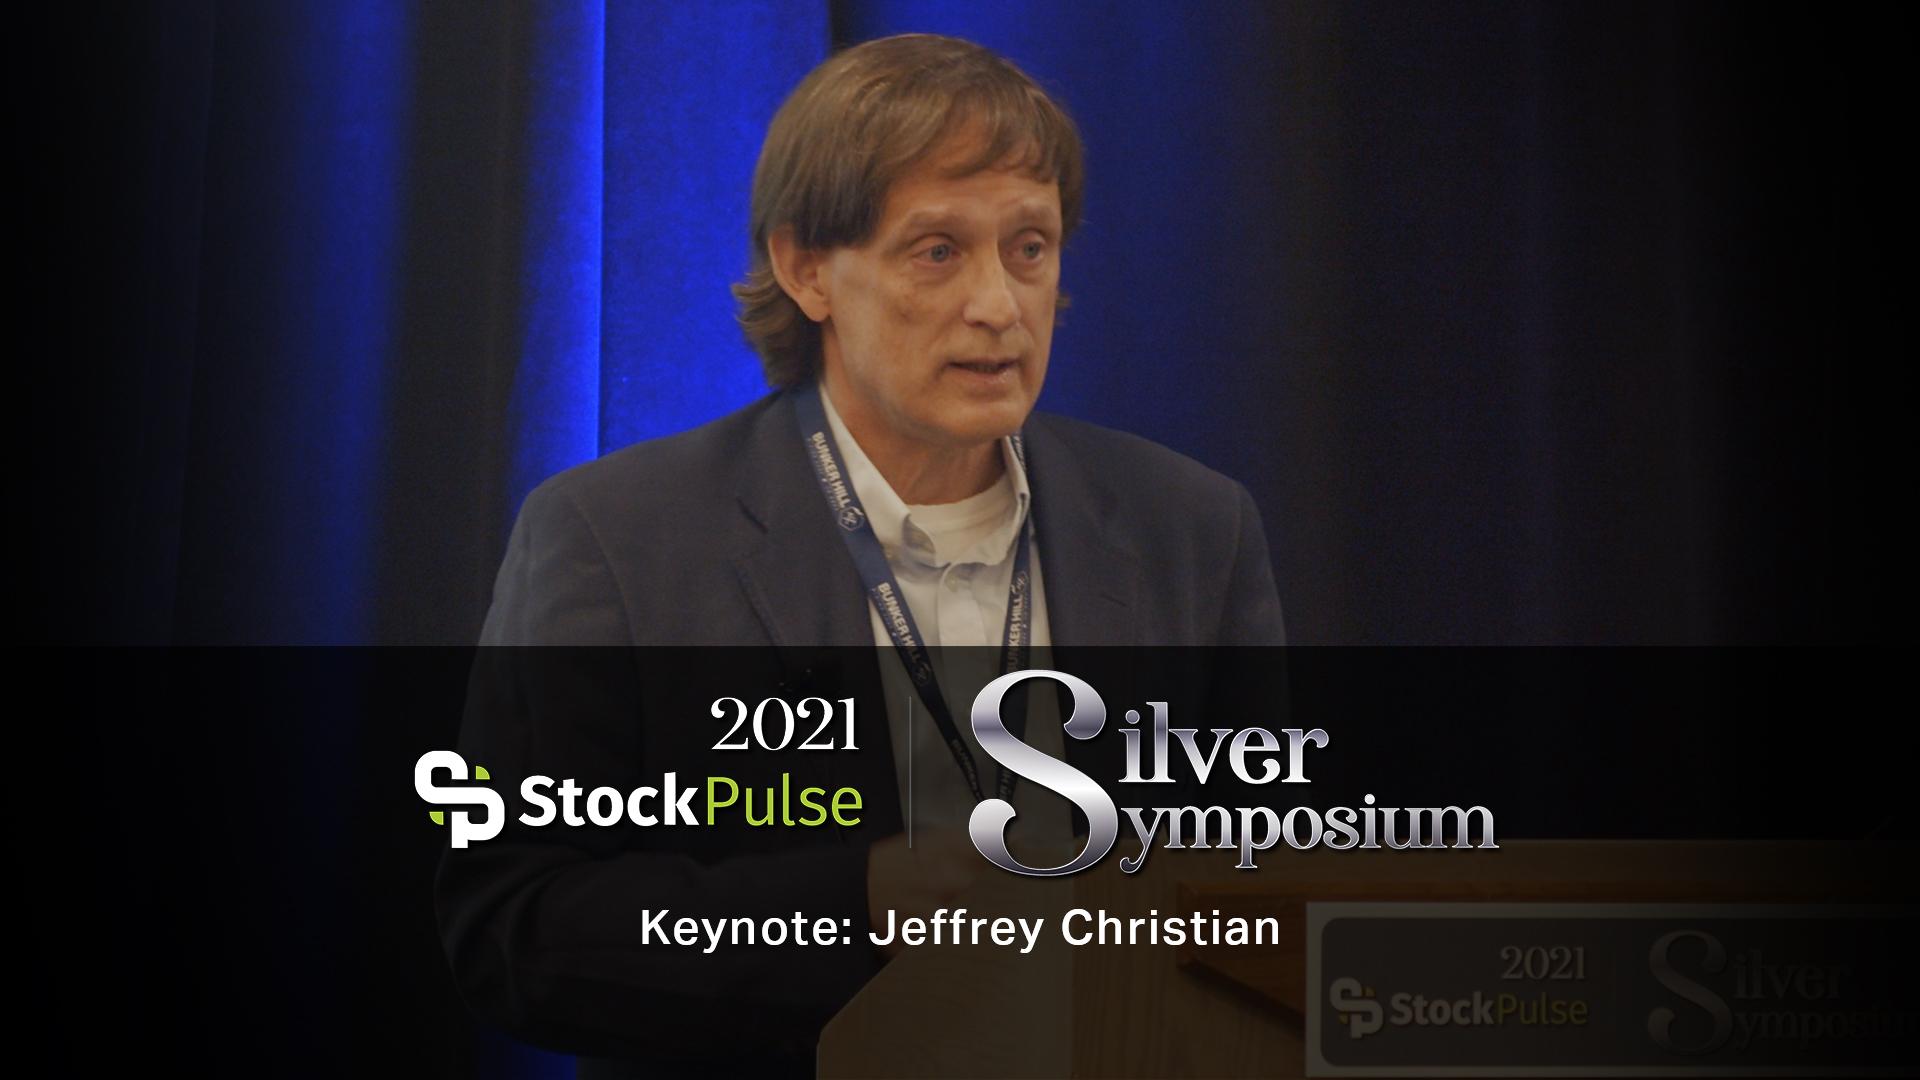 Keynote Jeffrey Christian: There ISN'T A Silver Manipulation Conspiracy